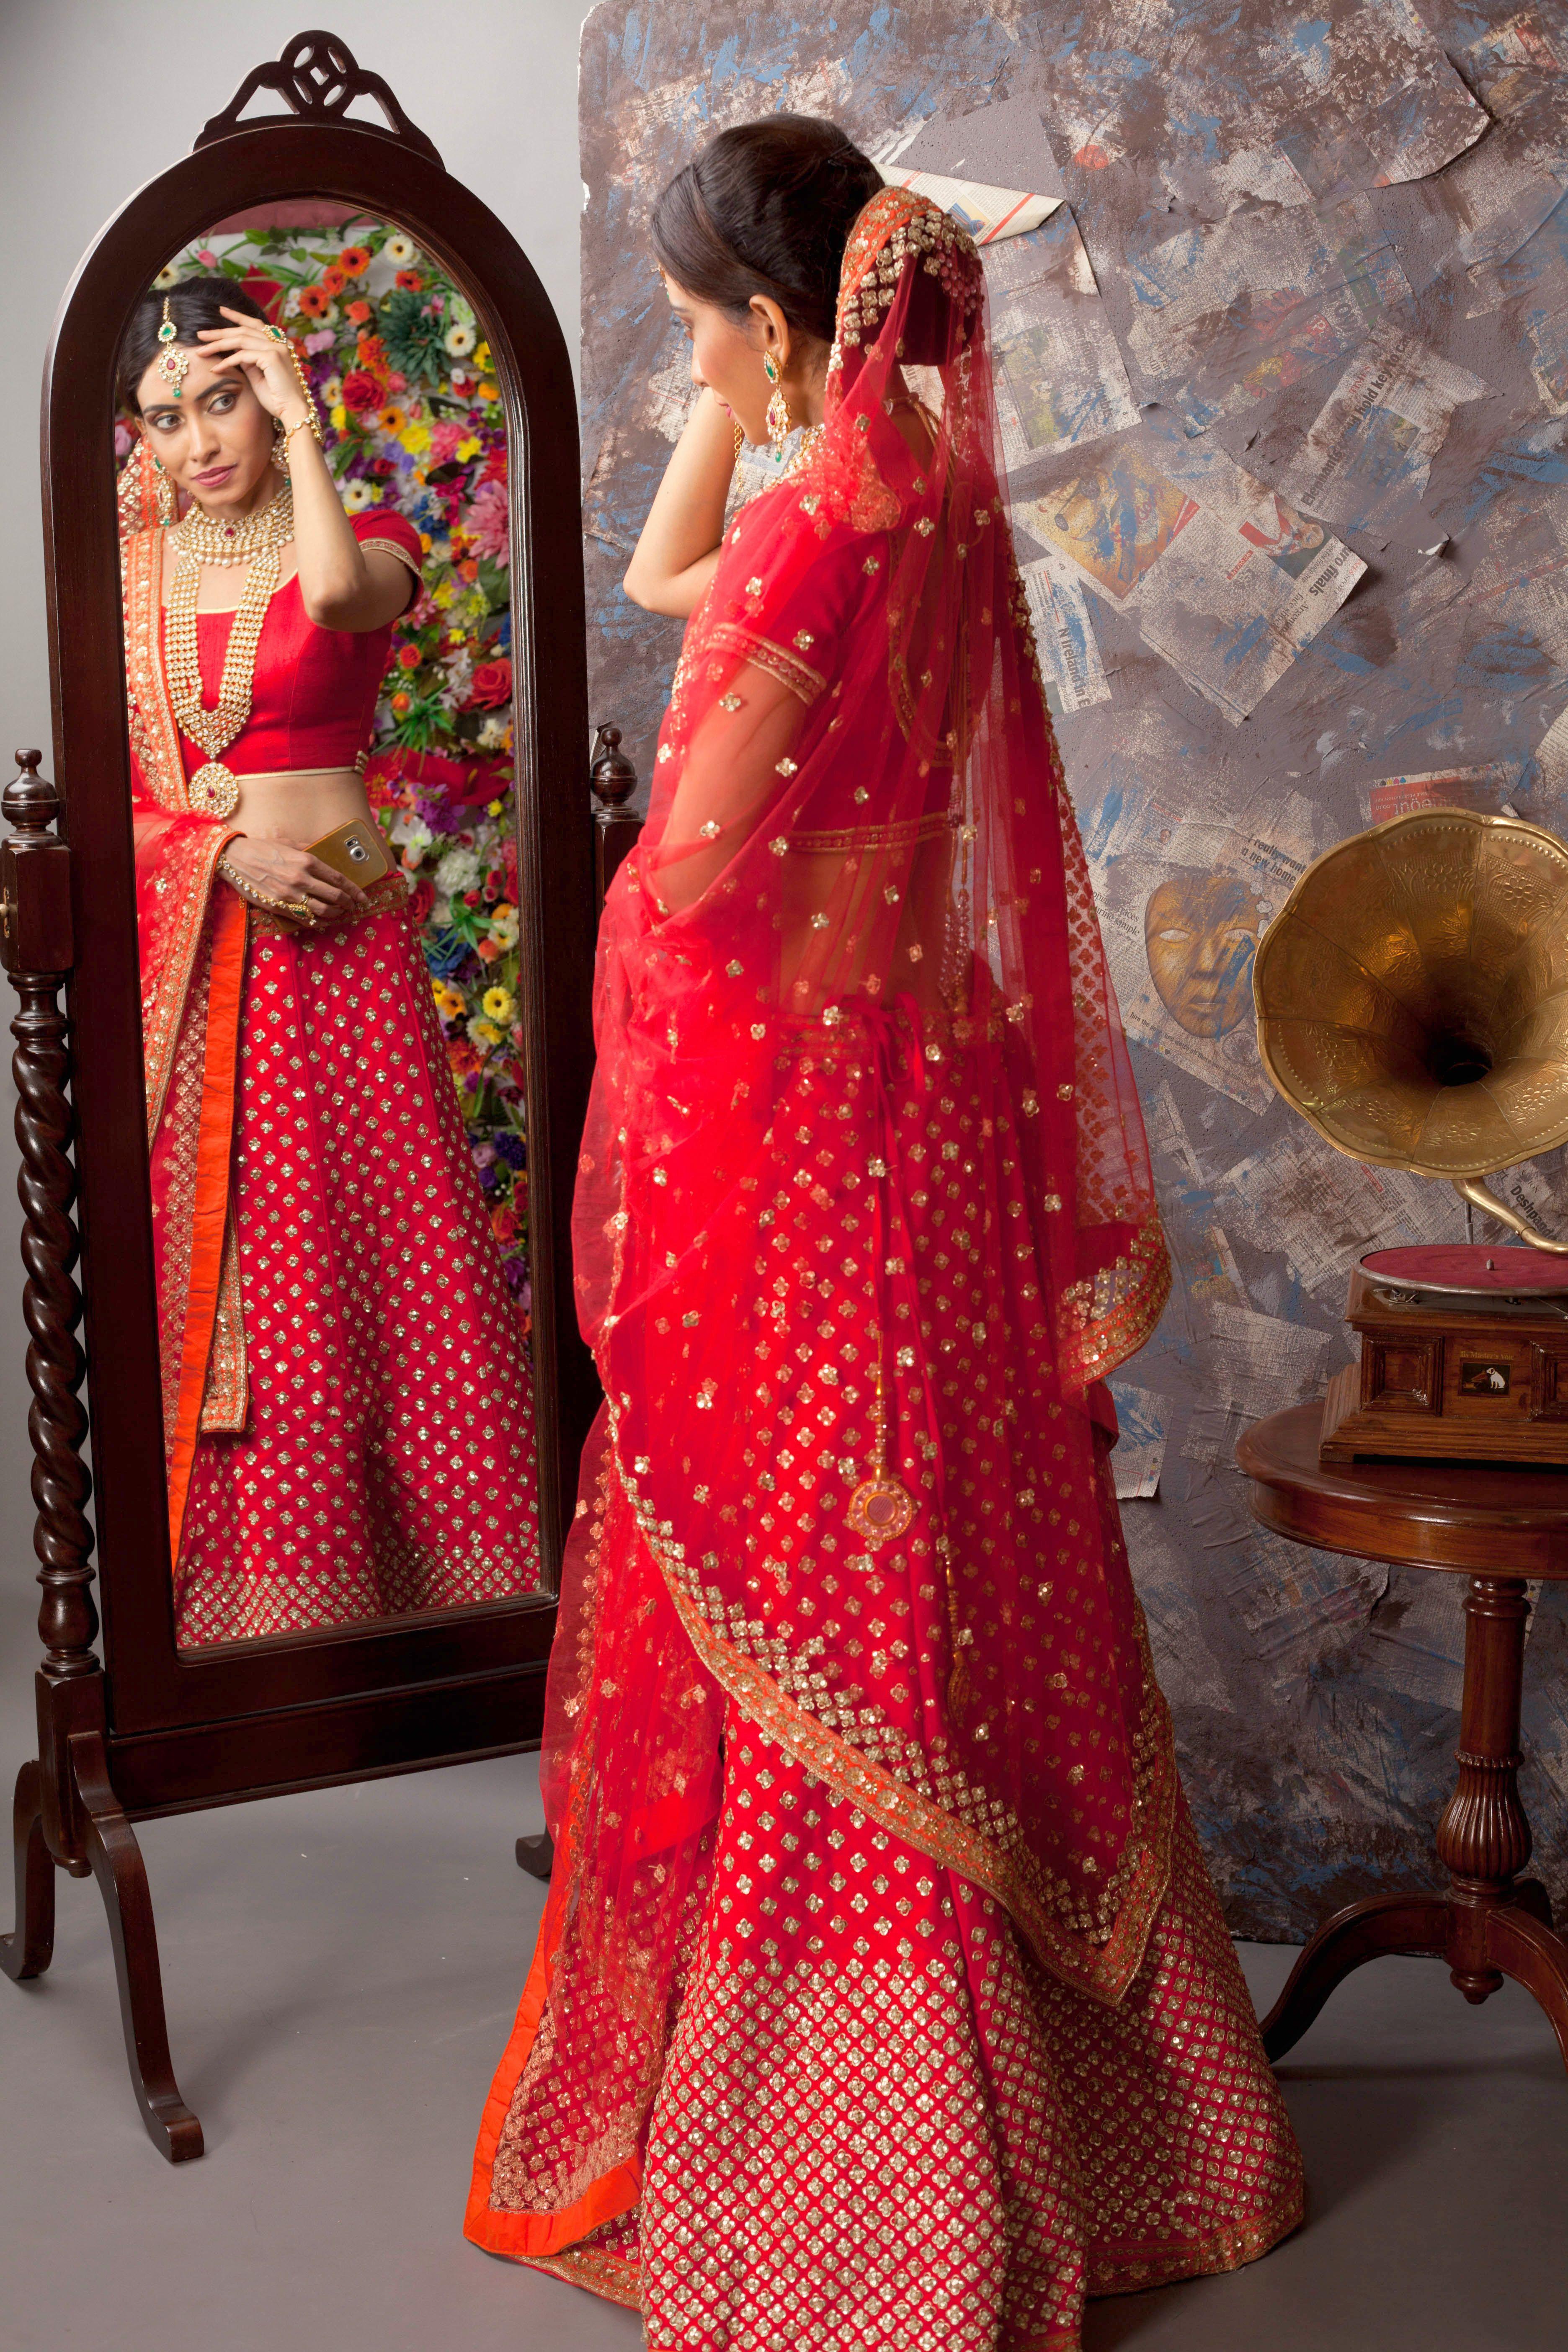 Red Bridal Lehenga Adorned With Intricate Golden Butti Work Our Bridal Lehenga Jewellery Co Indian Wedding Fashion Bridal Lehenga Red Indian Bridal Lehenga